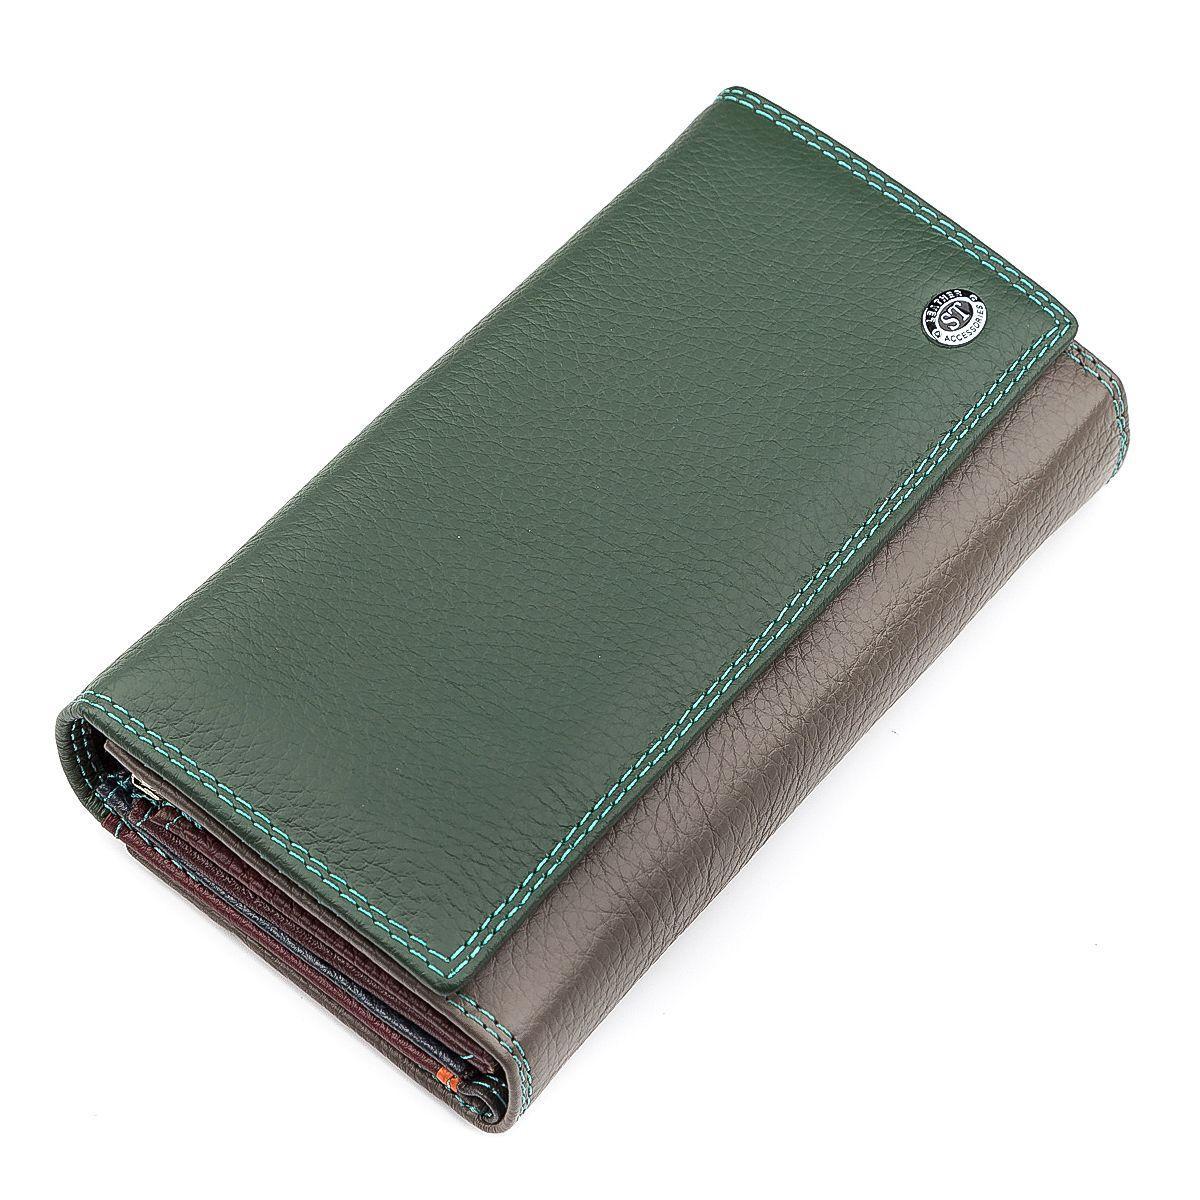 Кошелек женский ST Leather 18415 (SB46) Зеленый, Зеленый